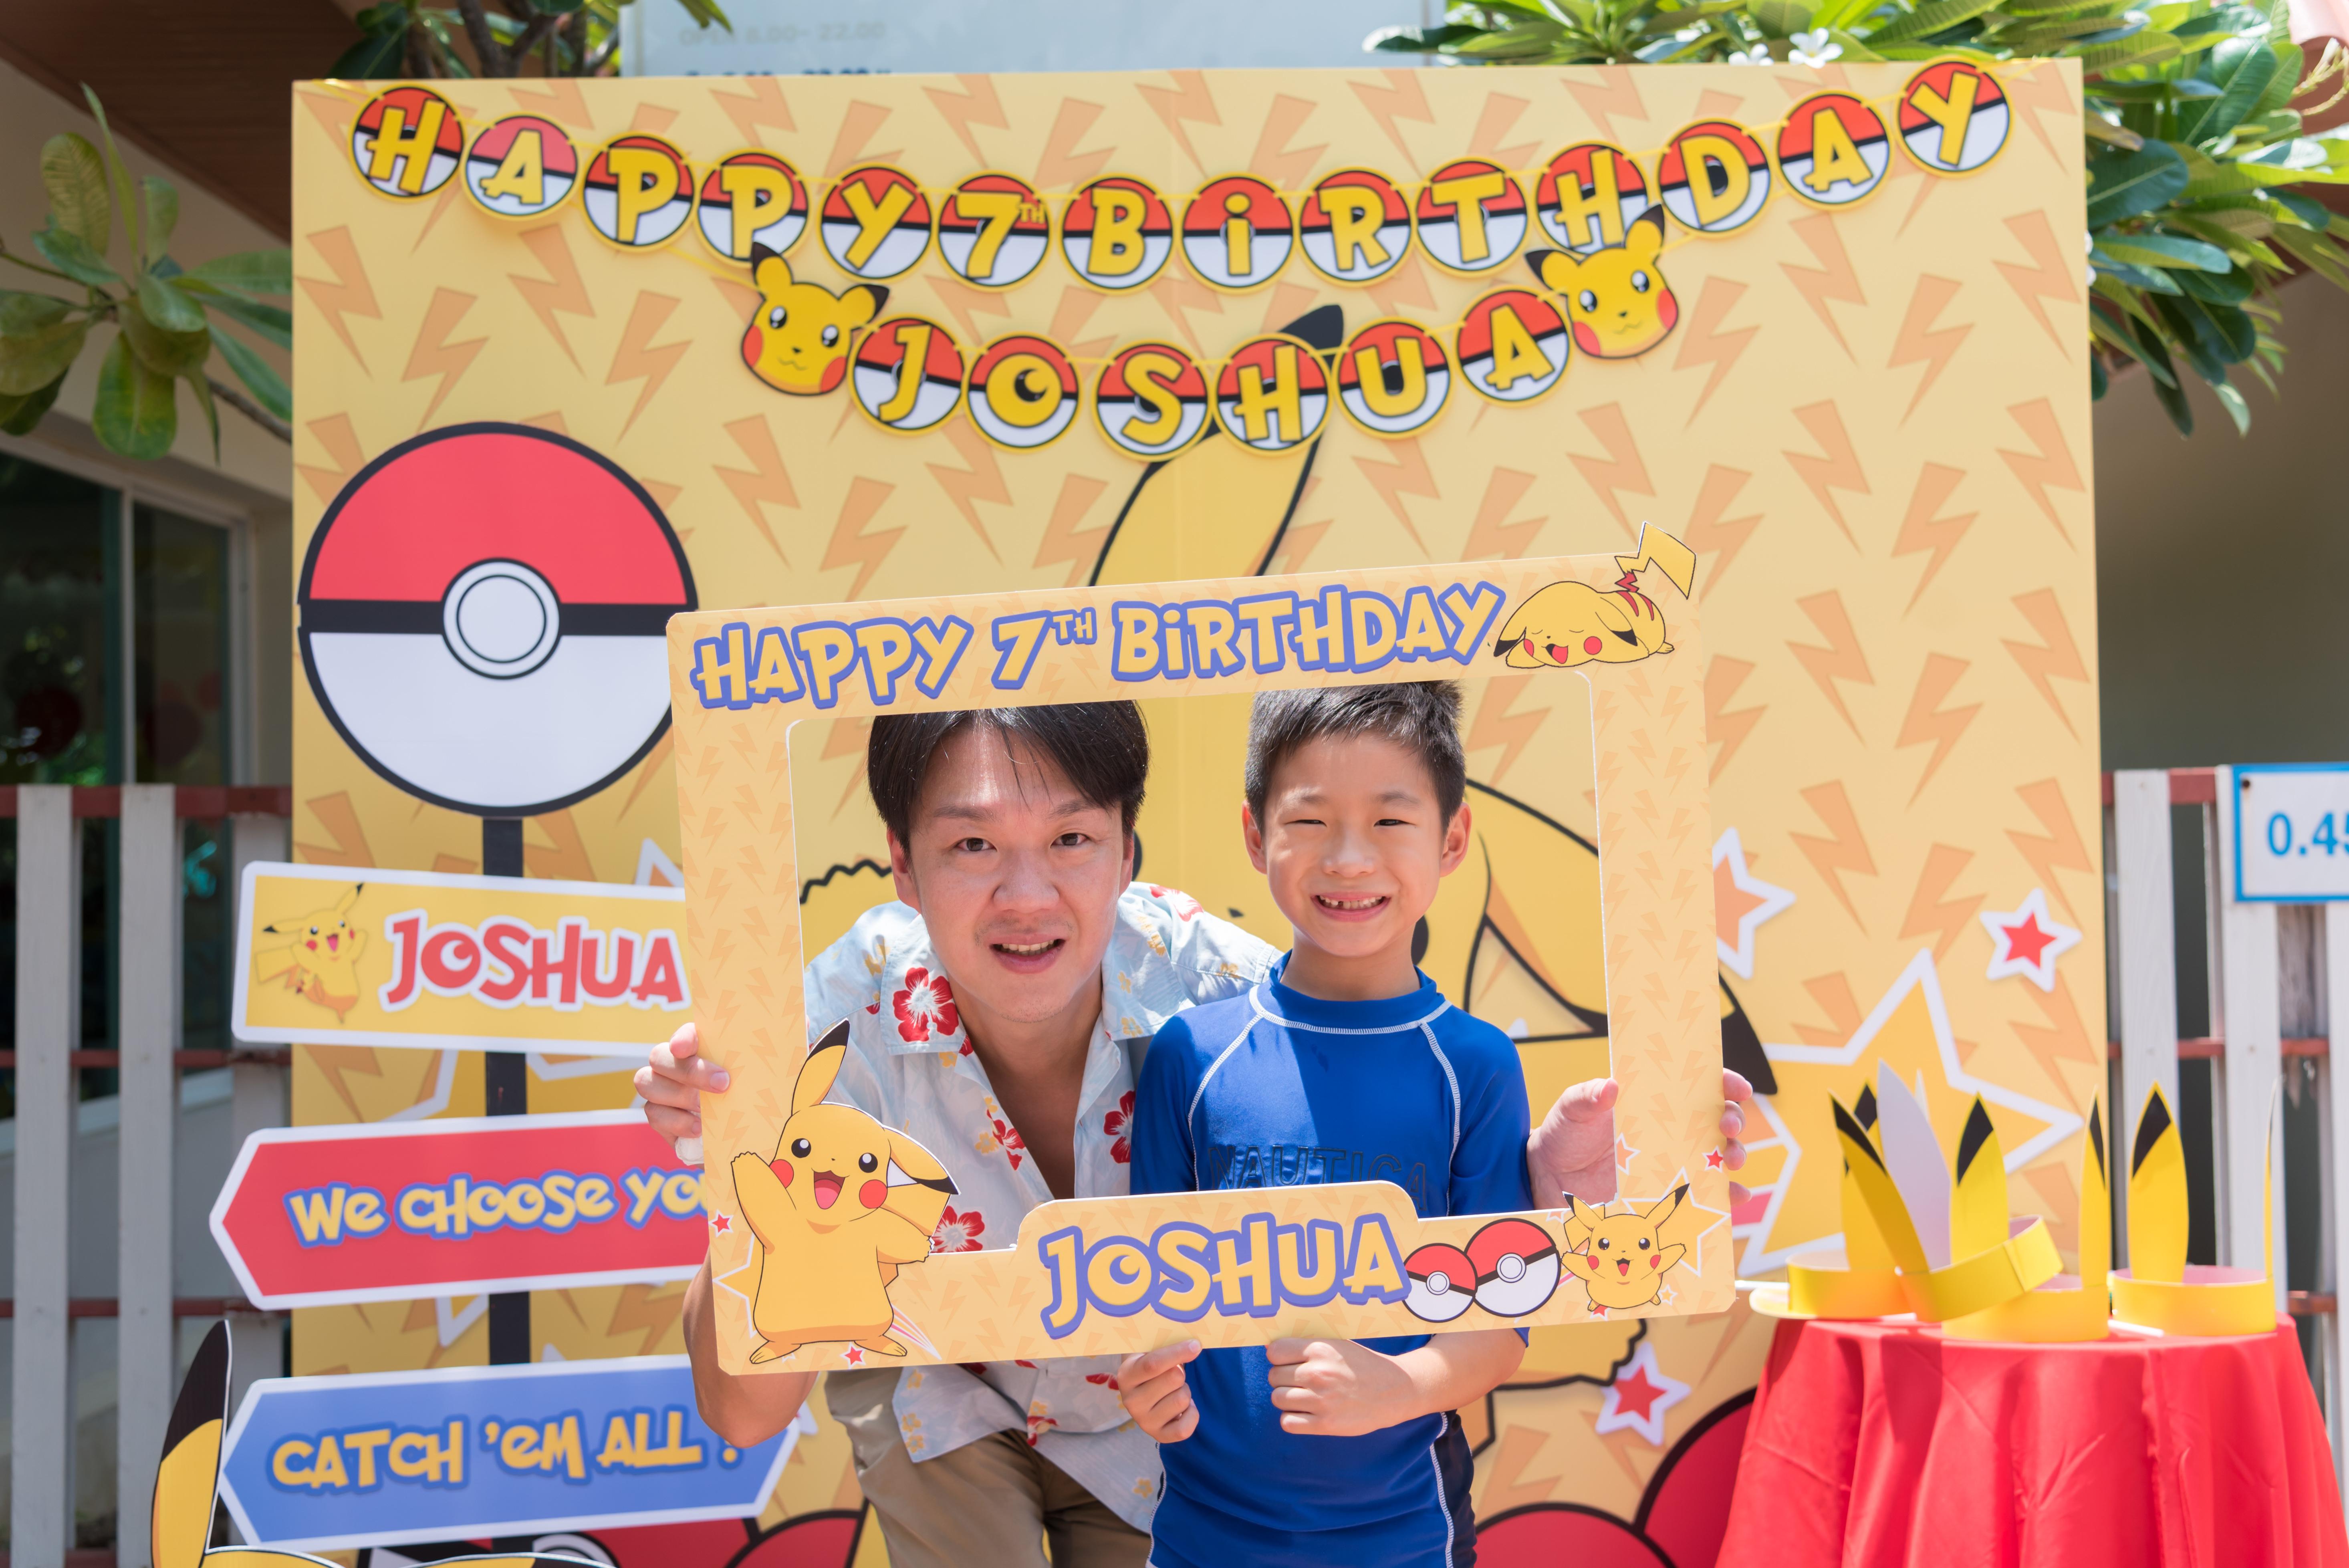 Favorite birtday theme, Pokemon and Pikachu - Choosing us, the birthday party organizer providing decoration, birthday cake, entertainments, party games, bozo, magician, balloon twist, clowns, mascot, show and more fun stuffs